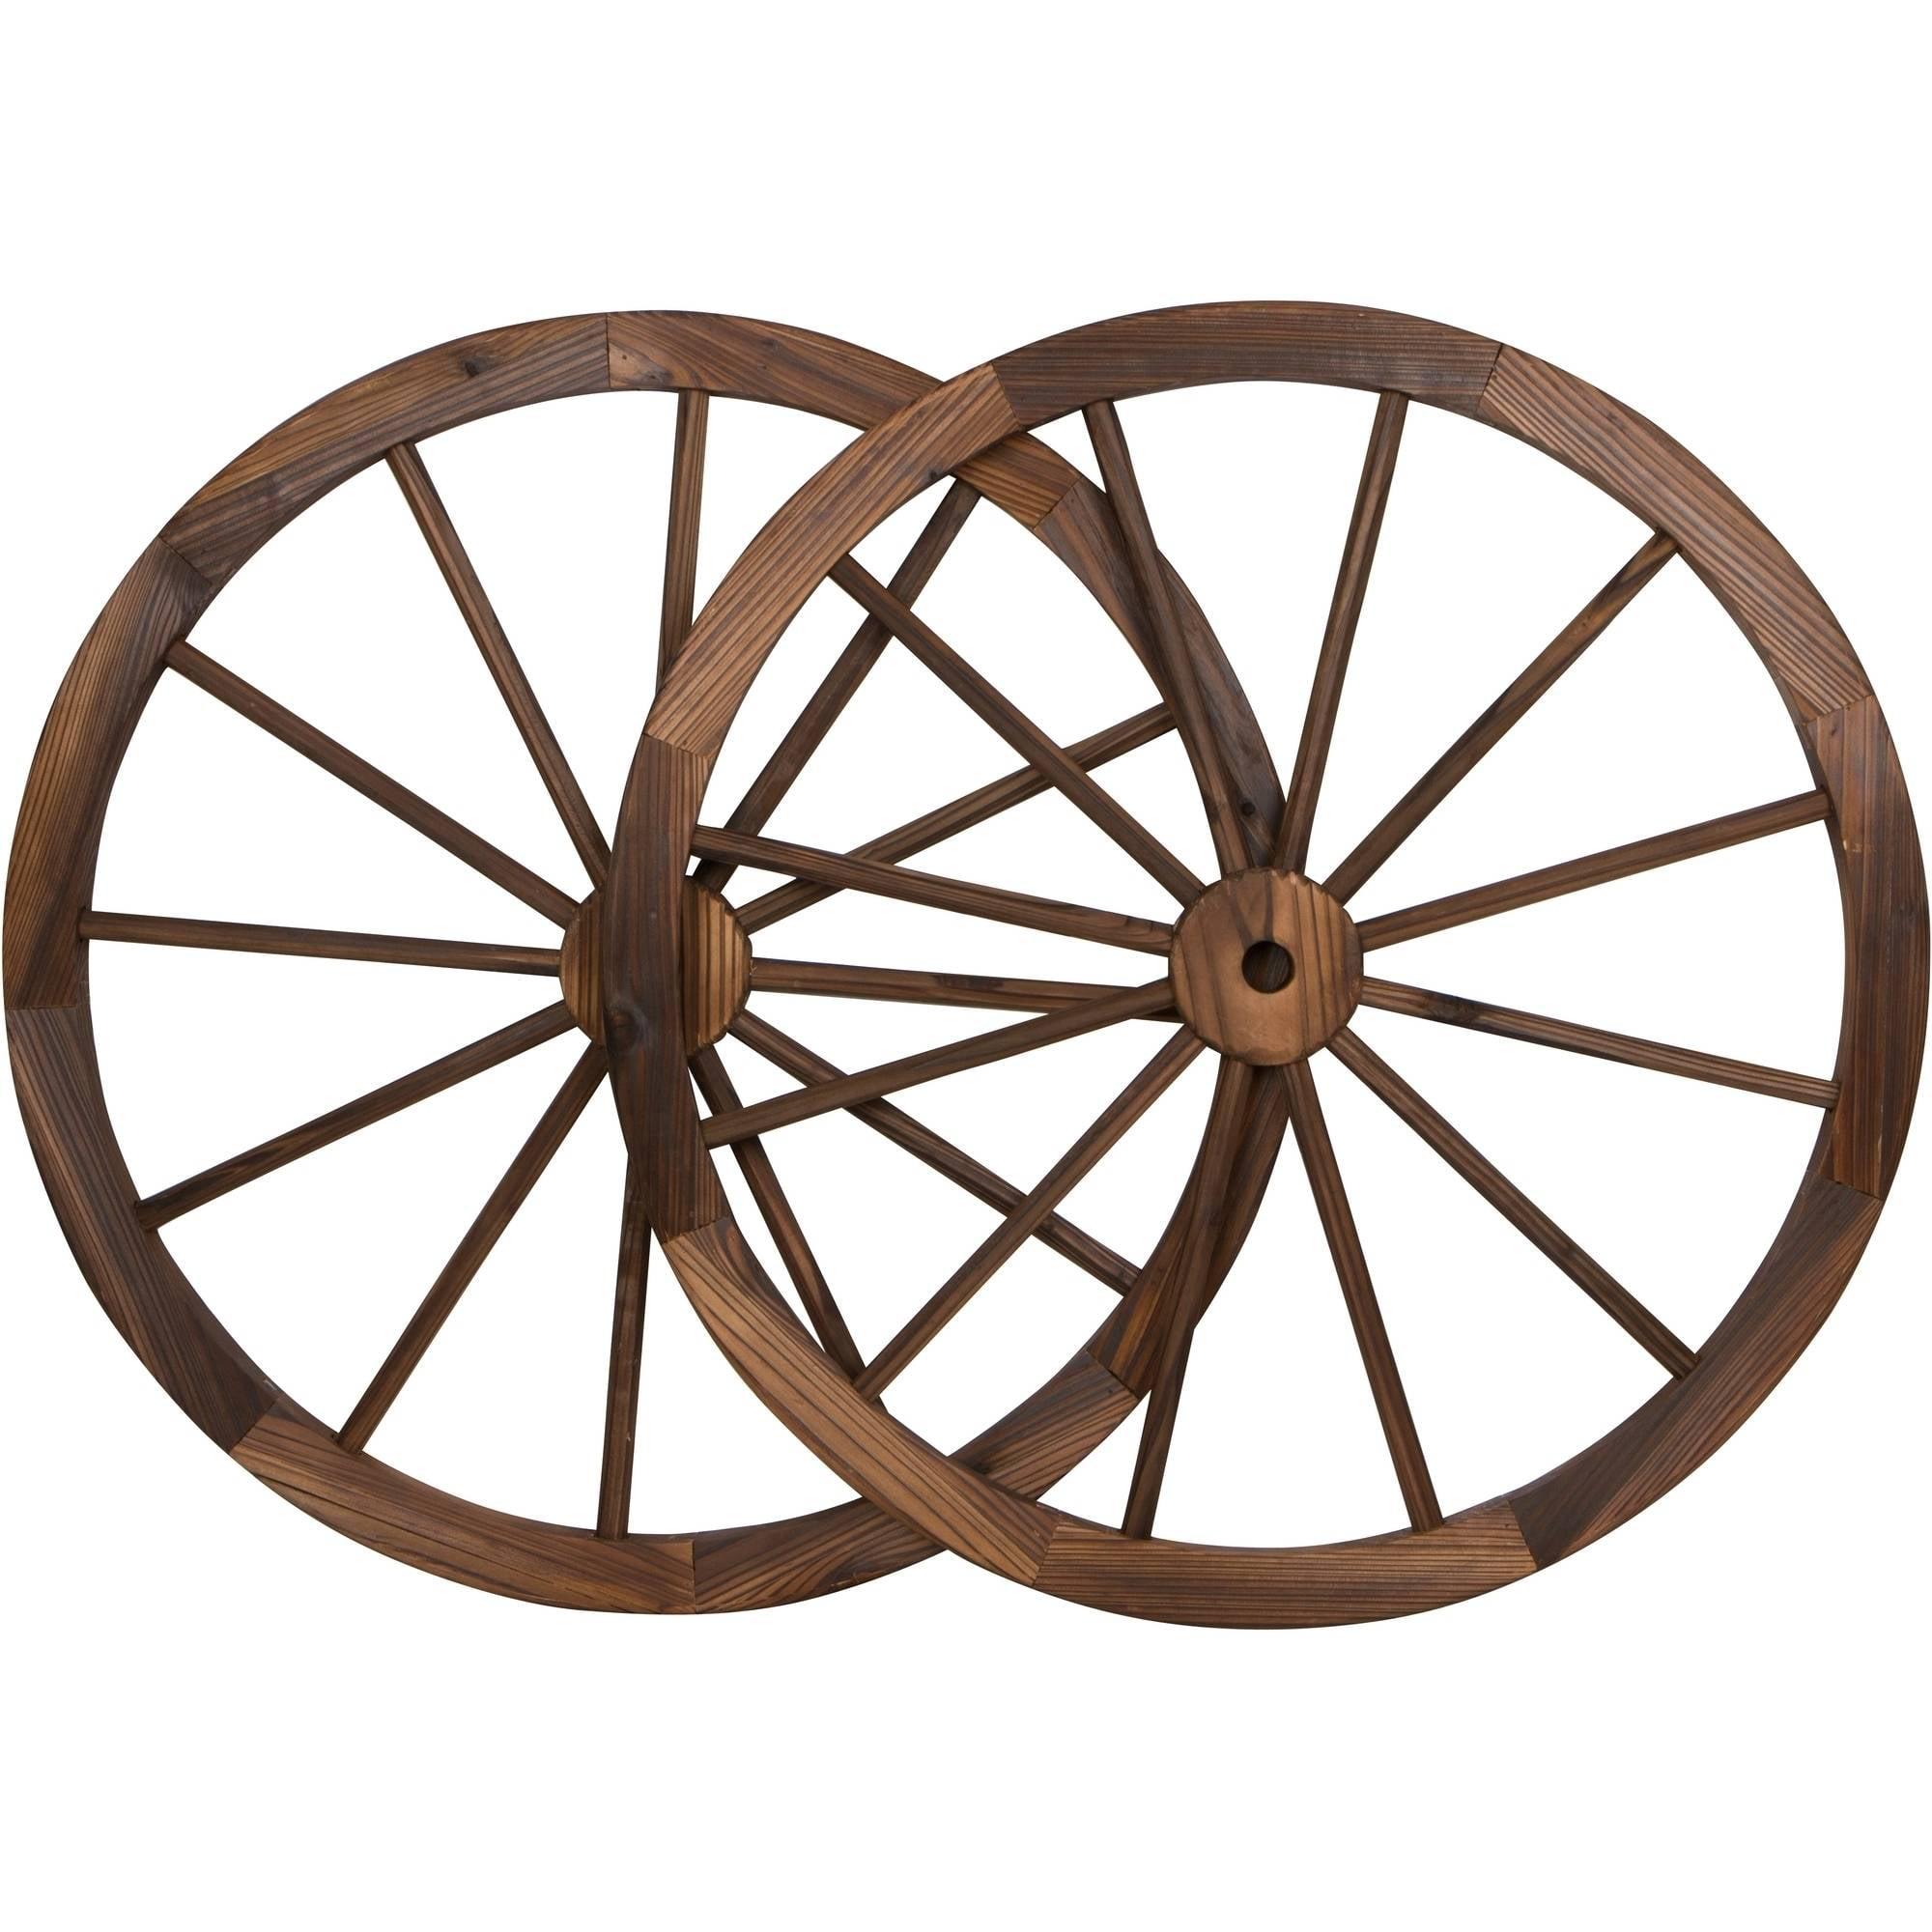 "Decorative Vintage Wood Garden Wagon Wheel With Steel Rim, 30"" Diameter, Set of 2"